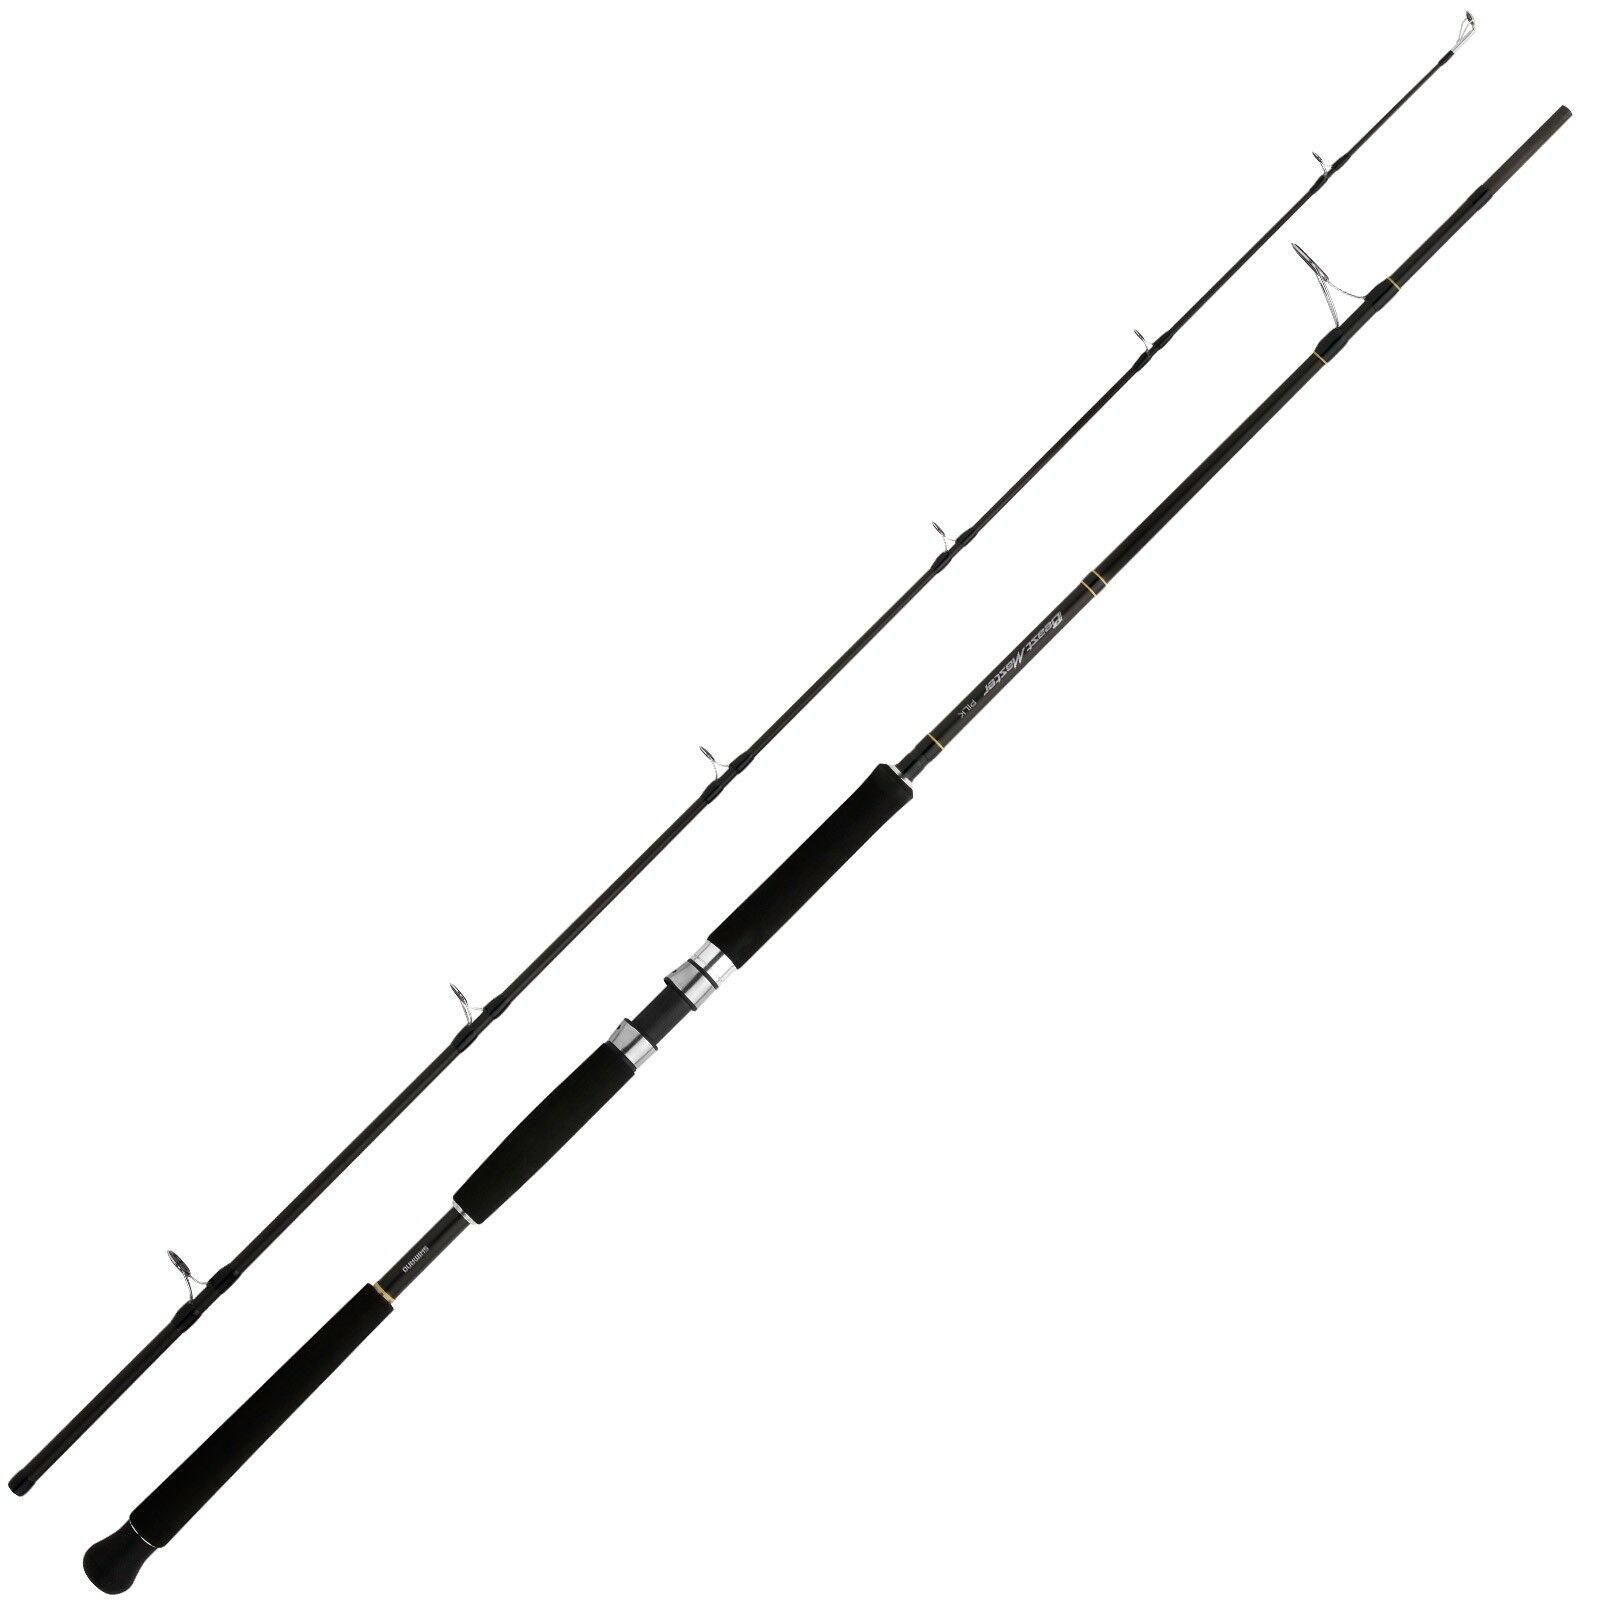 Shimano Meeresrute Pilkrute Pilkrute Pilkrute Beast Master Pilk 240 2 40m 150-300g d48722